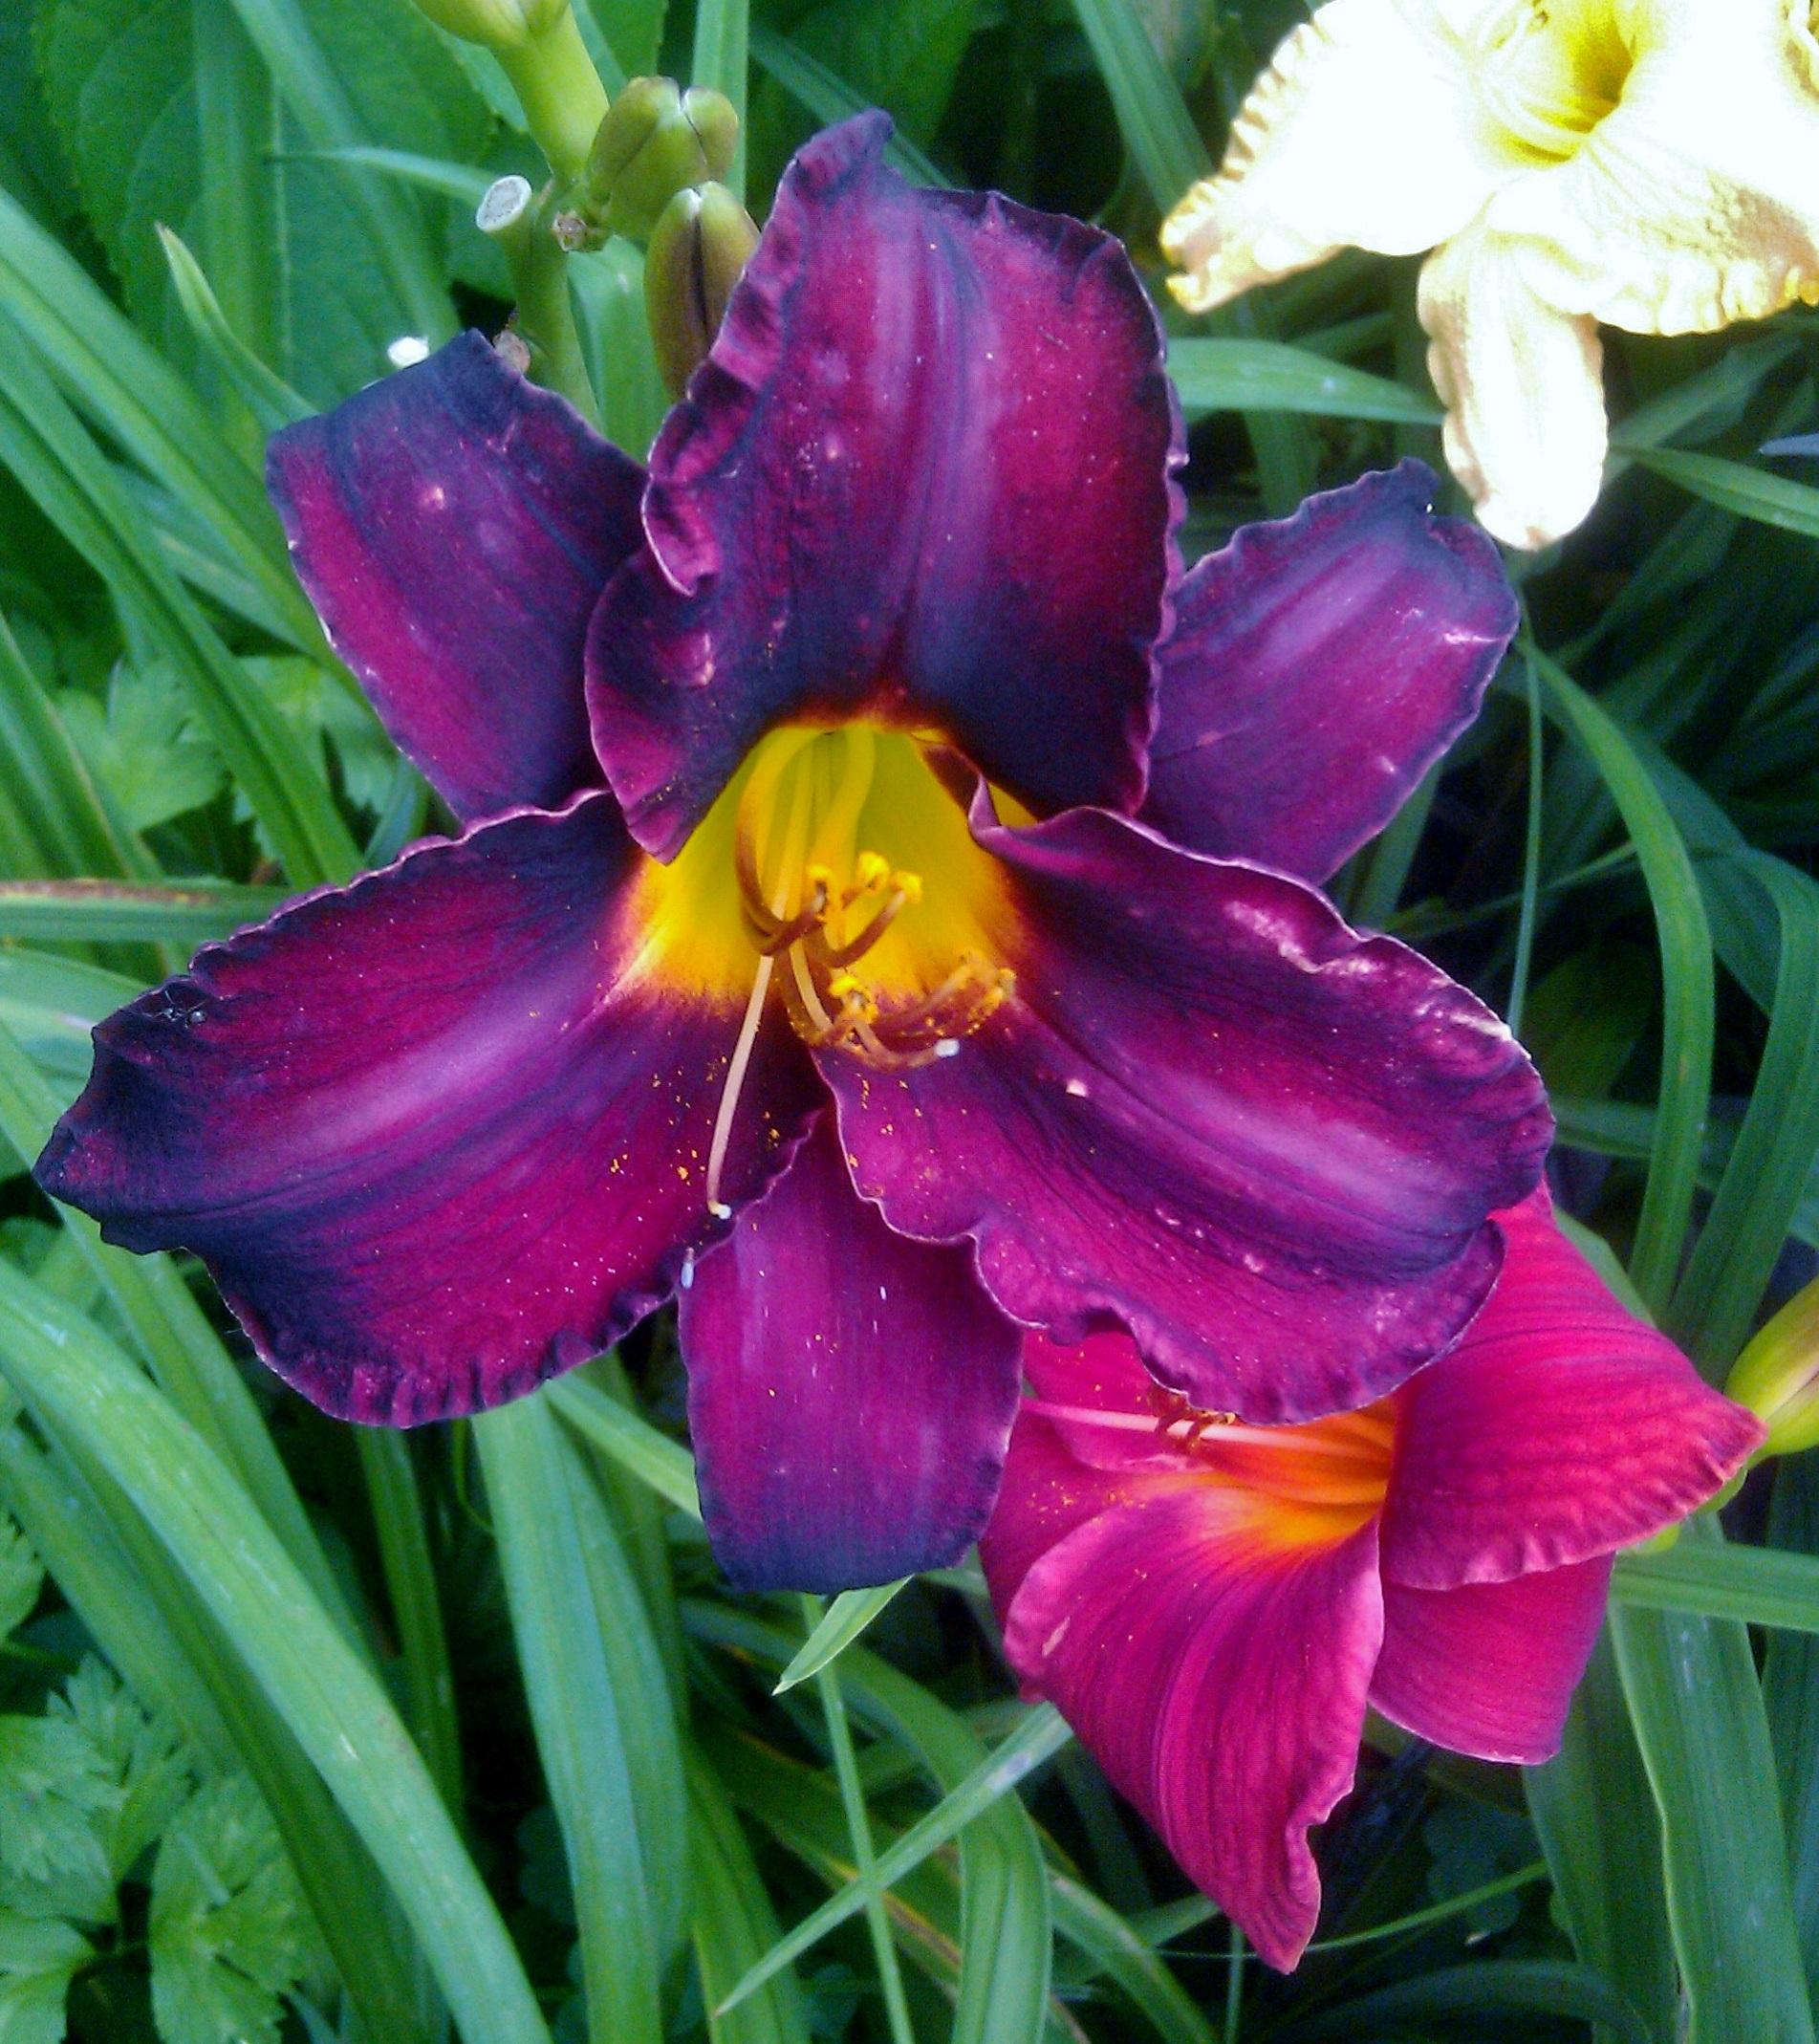 Free images flower purple petal bloom summer garden daylily plant flower purple petal bloom summer garden daylily day lily flowering plant land plant izmirmasajfo Images